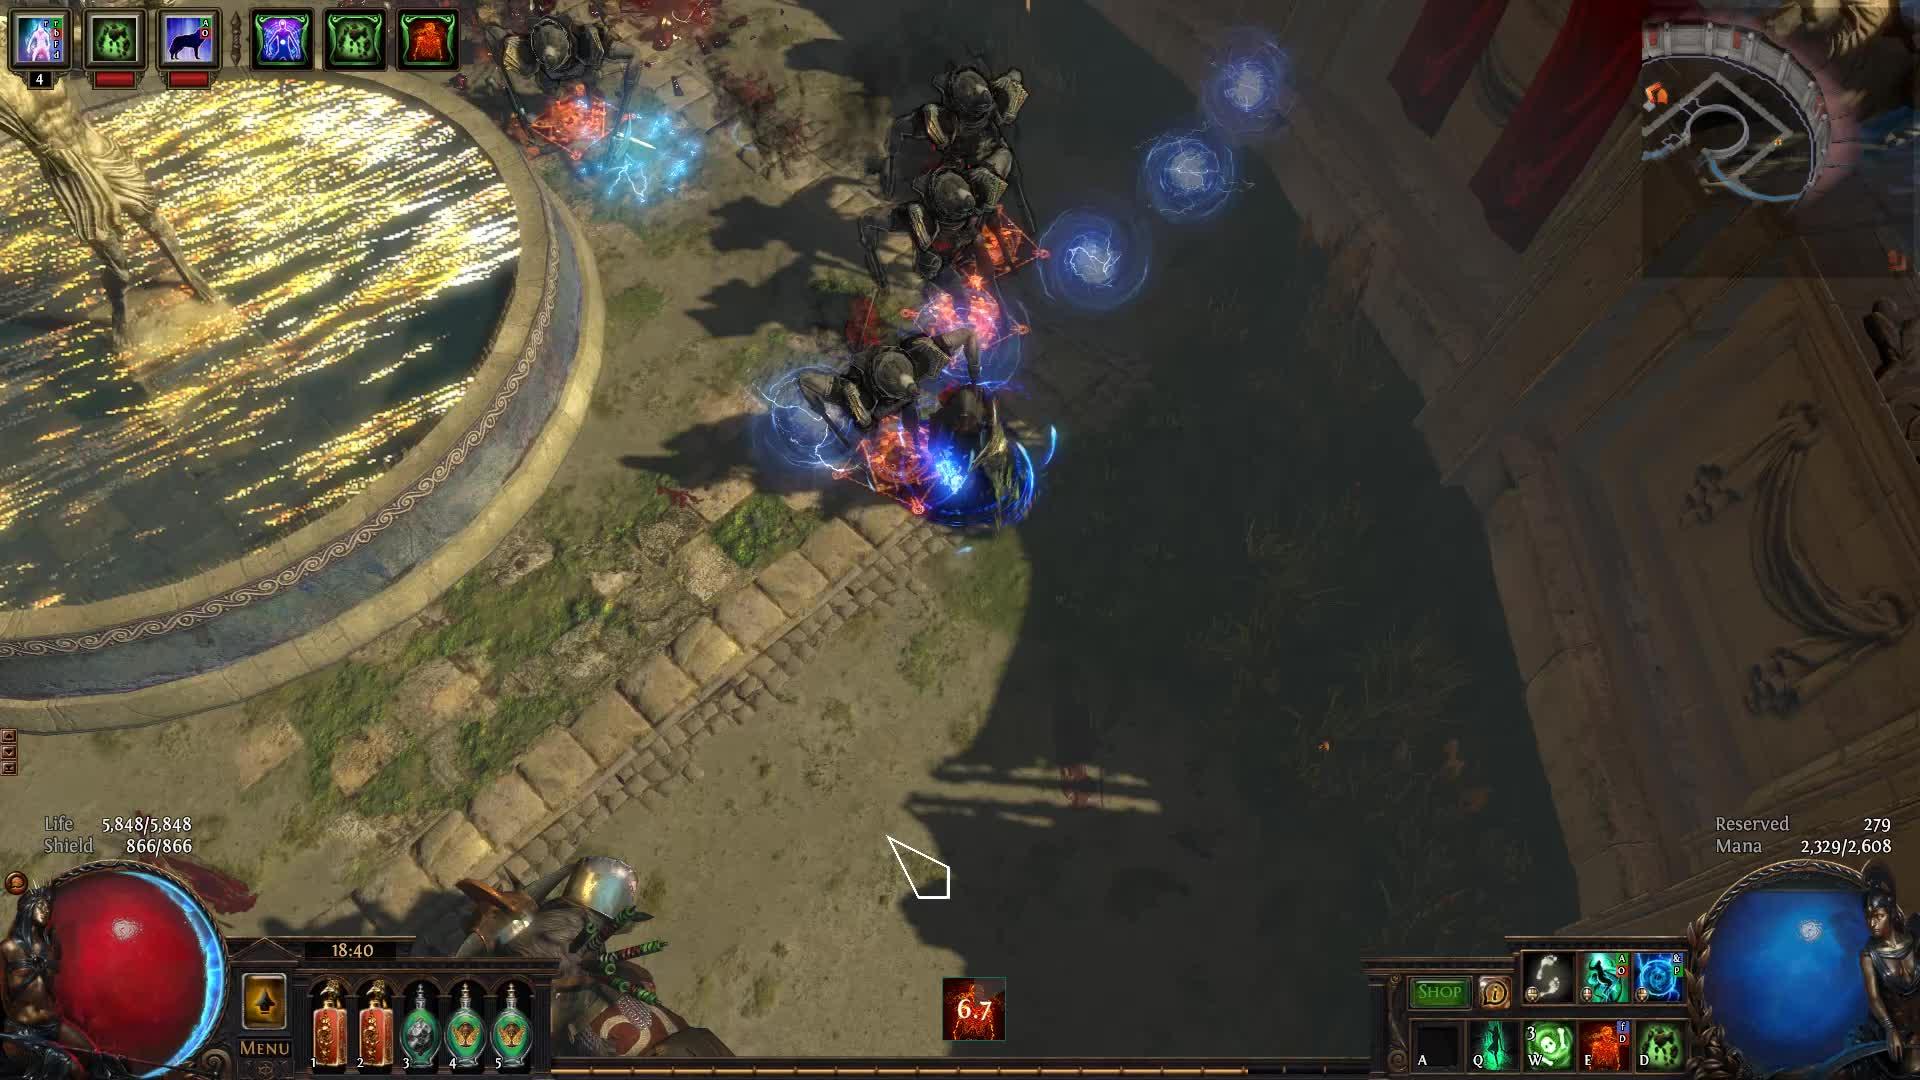 [Harbinger] Deefa_Adsignata lvl90 Necromancer Burning Spectres dies to  bosses